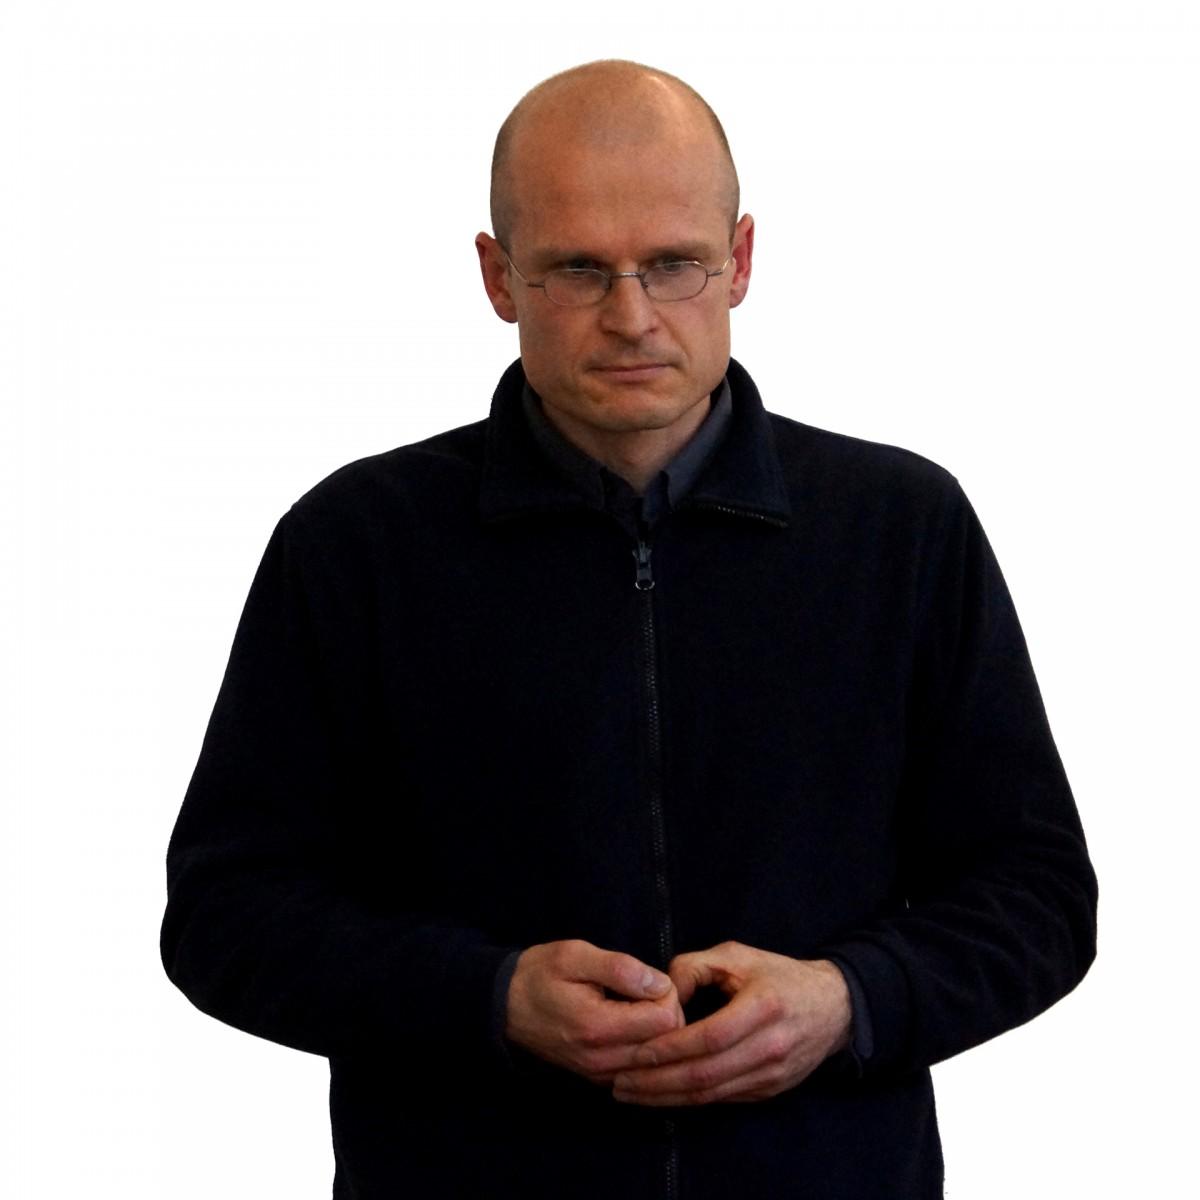 Jürgen Krause (Bild 1): Künstler im Gespräch – Kunsthaus Nürnberg (2015)